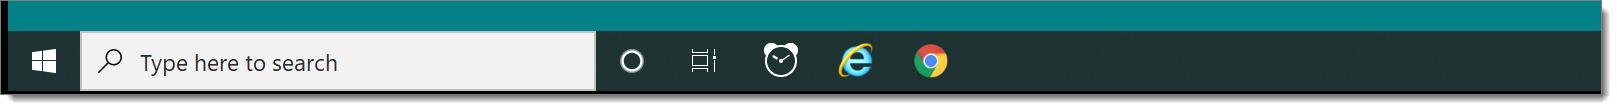 Windows taskbar replace mode